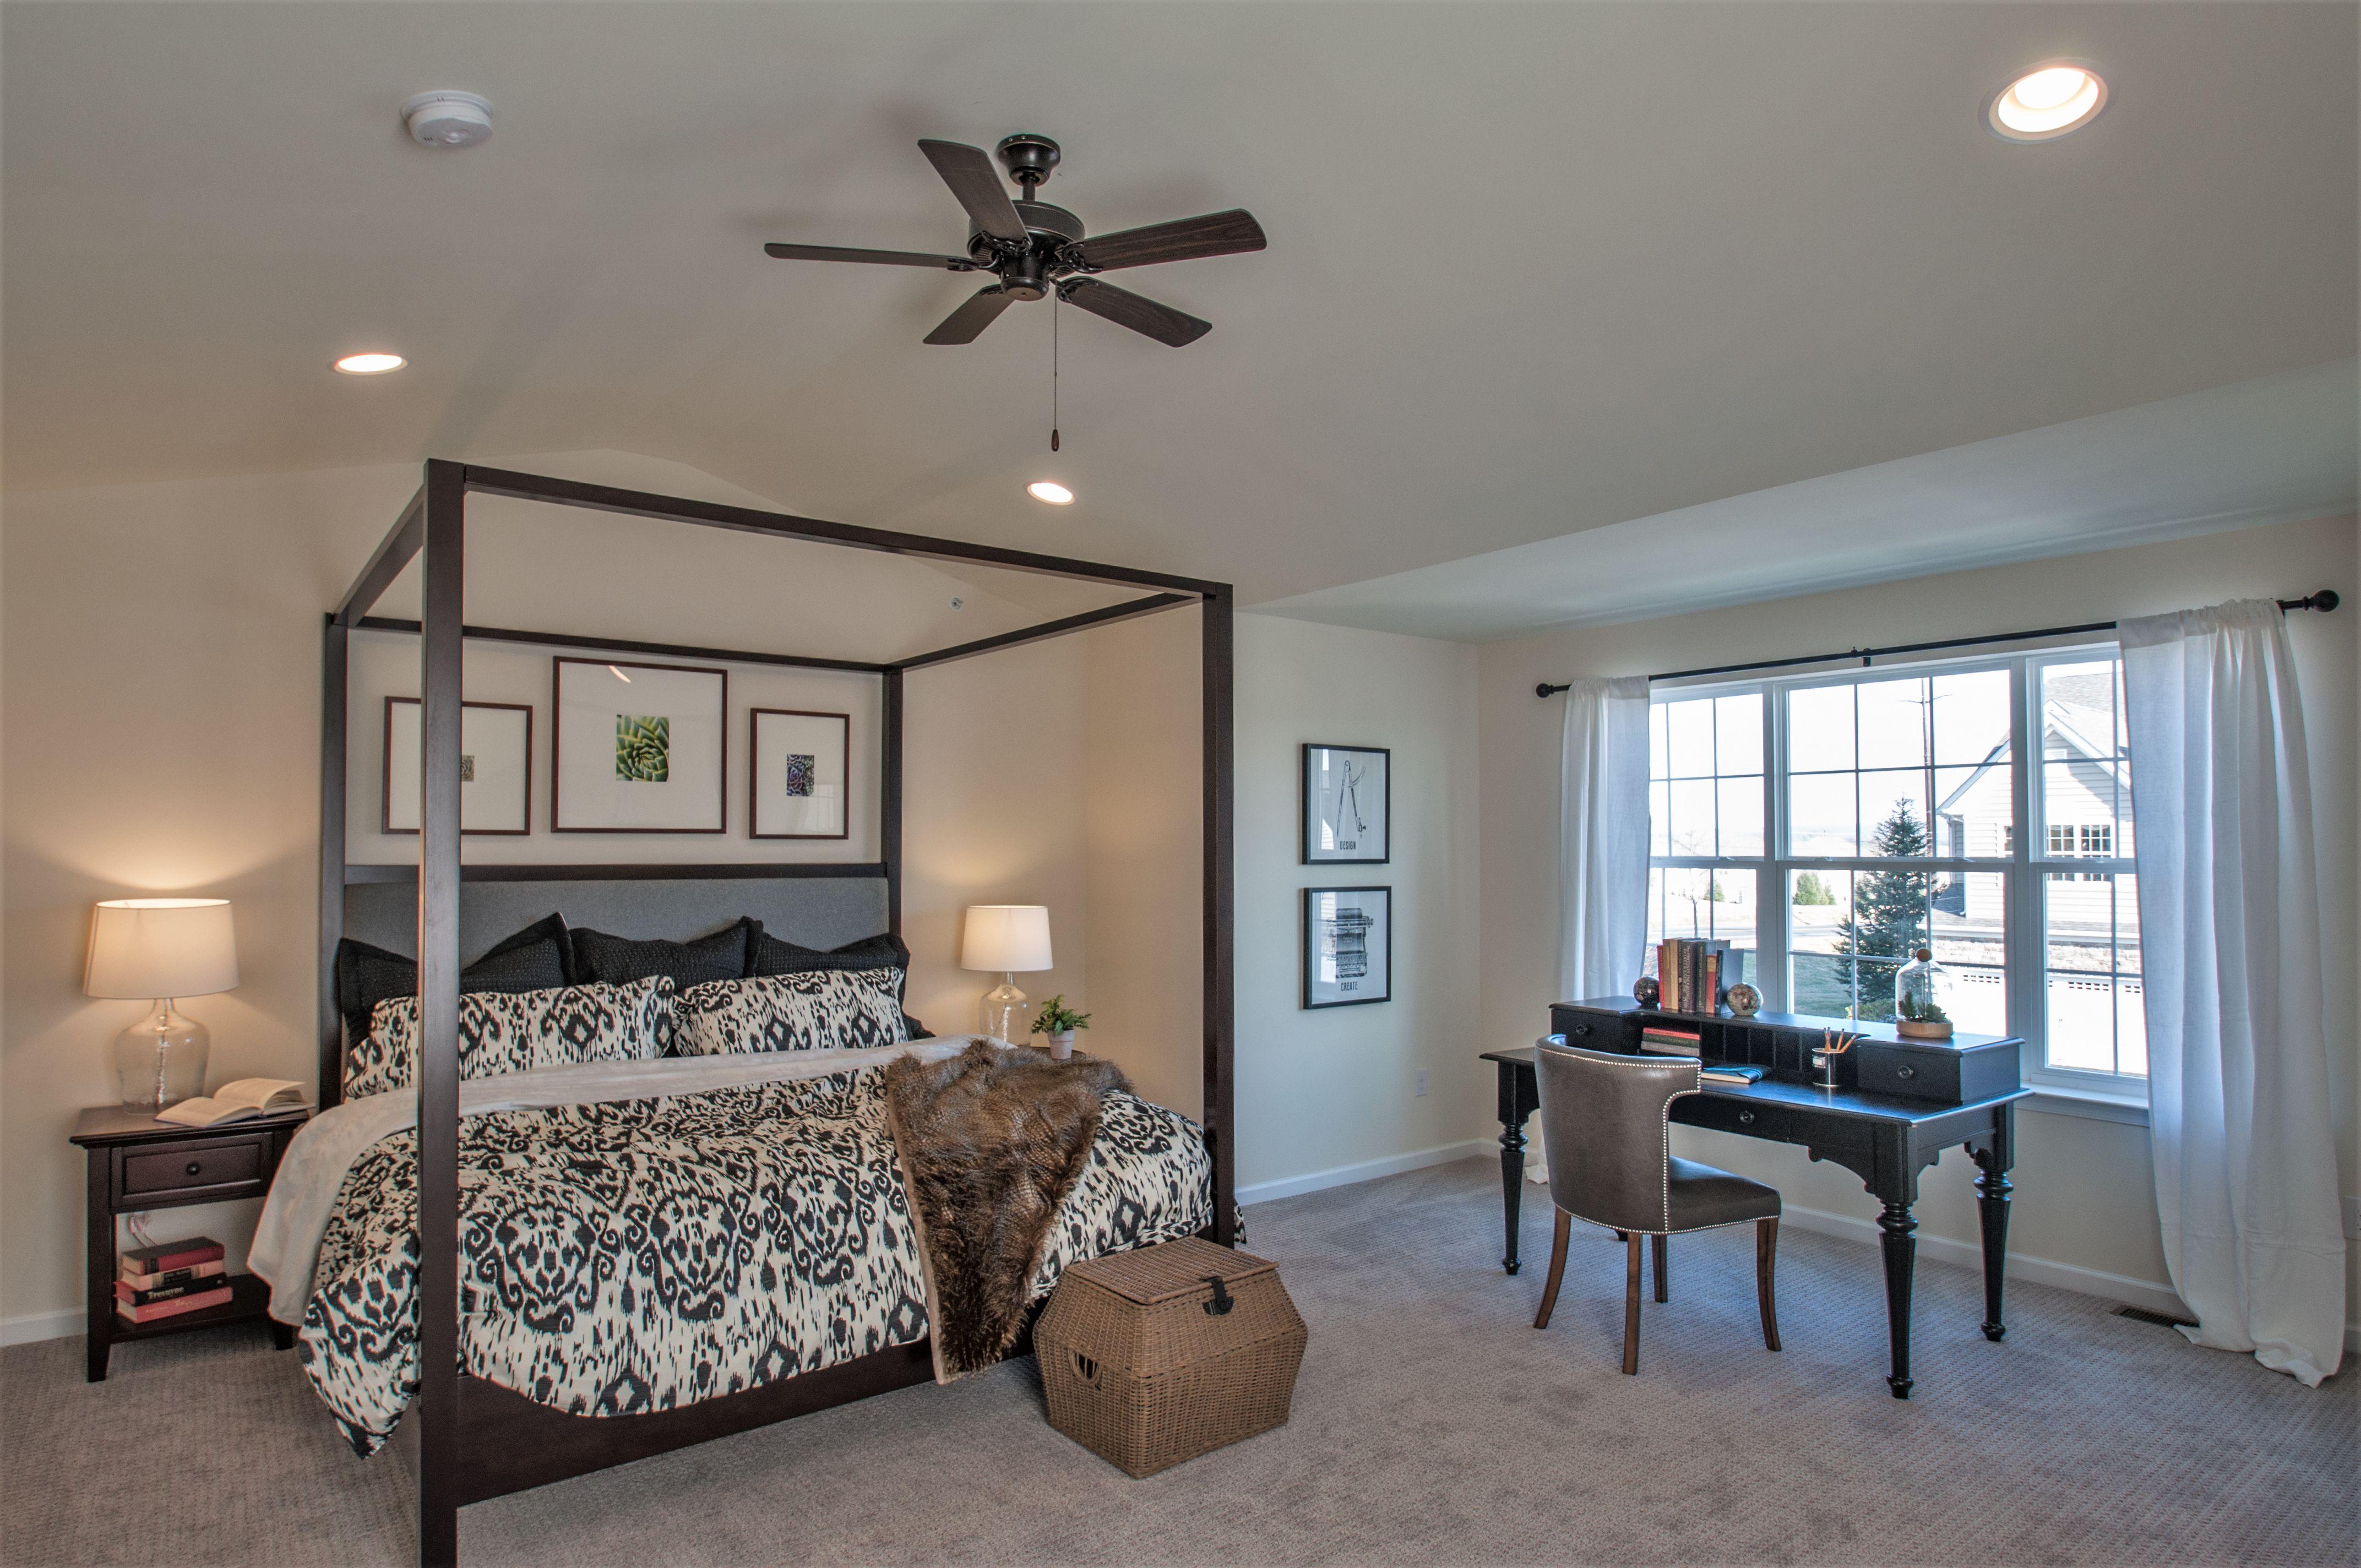 Bedroom featured in the Primrose By Sal Lapio Homes in Allentown-Bethlehem, PA